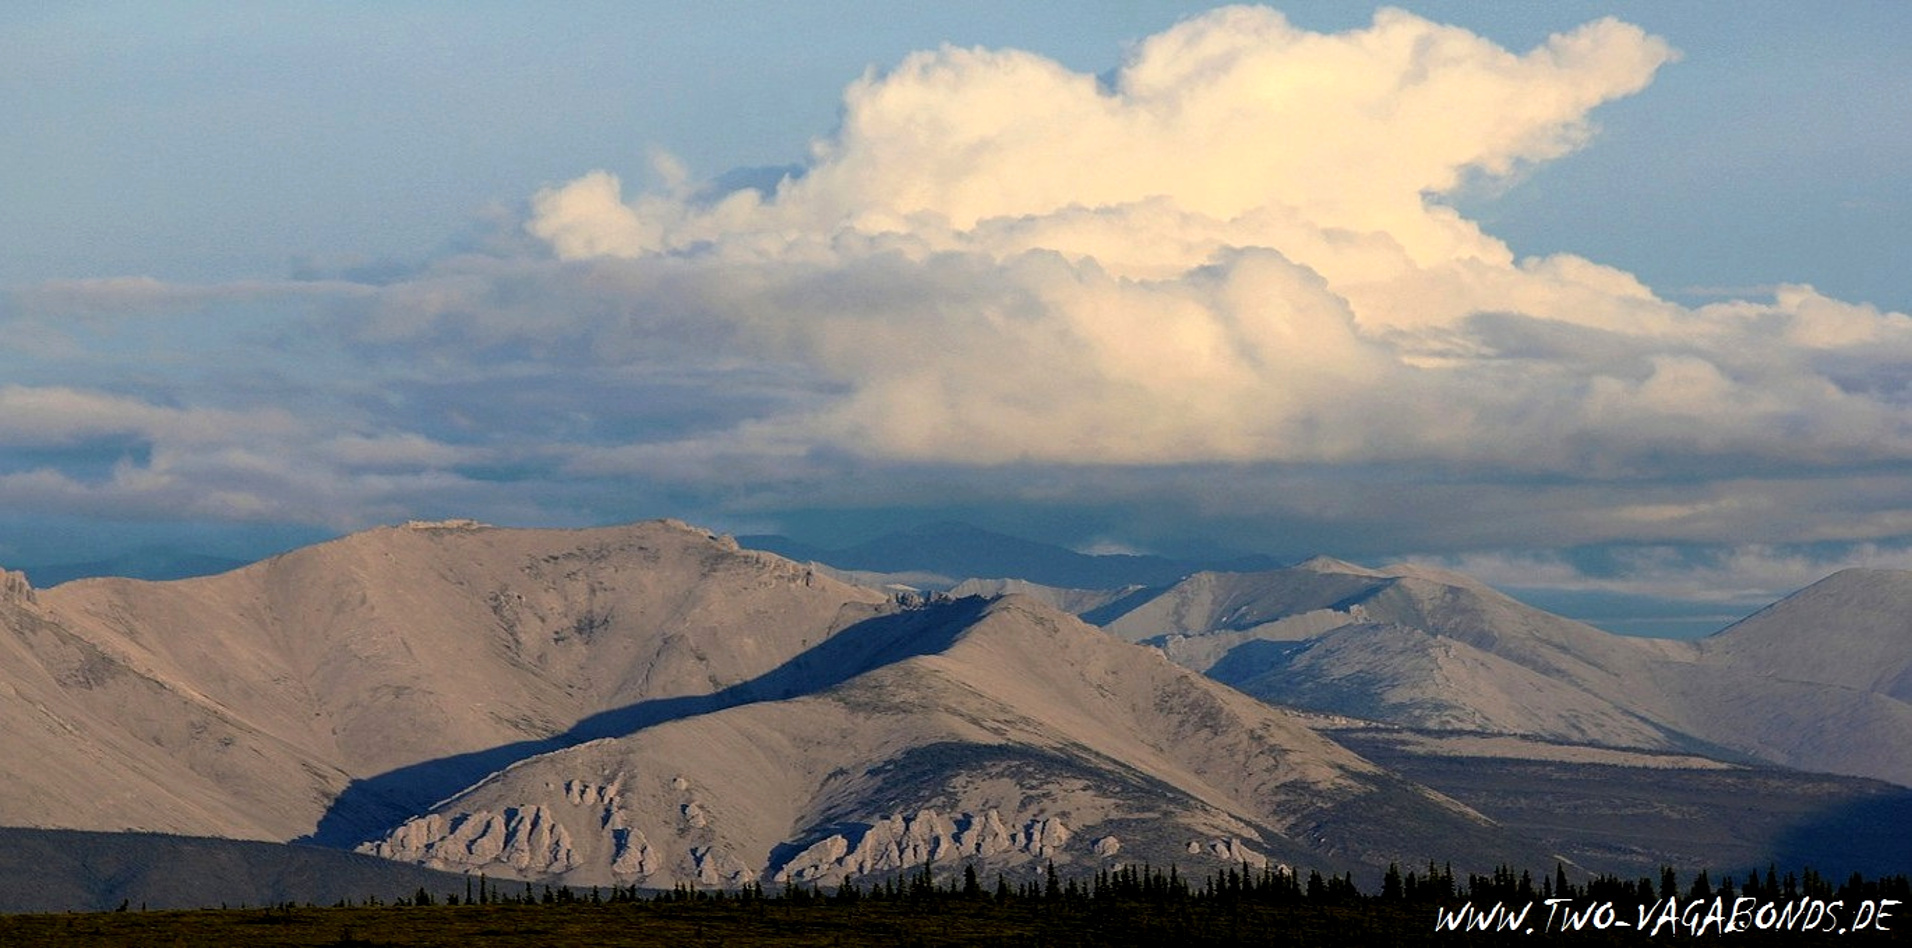 CANADA / YUKON 2011 - OGILVIE MOUNTAINS - DEMPSTER HIGHWAY